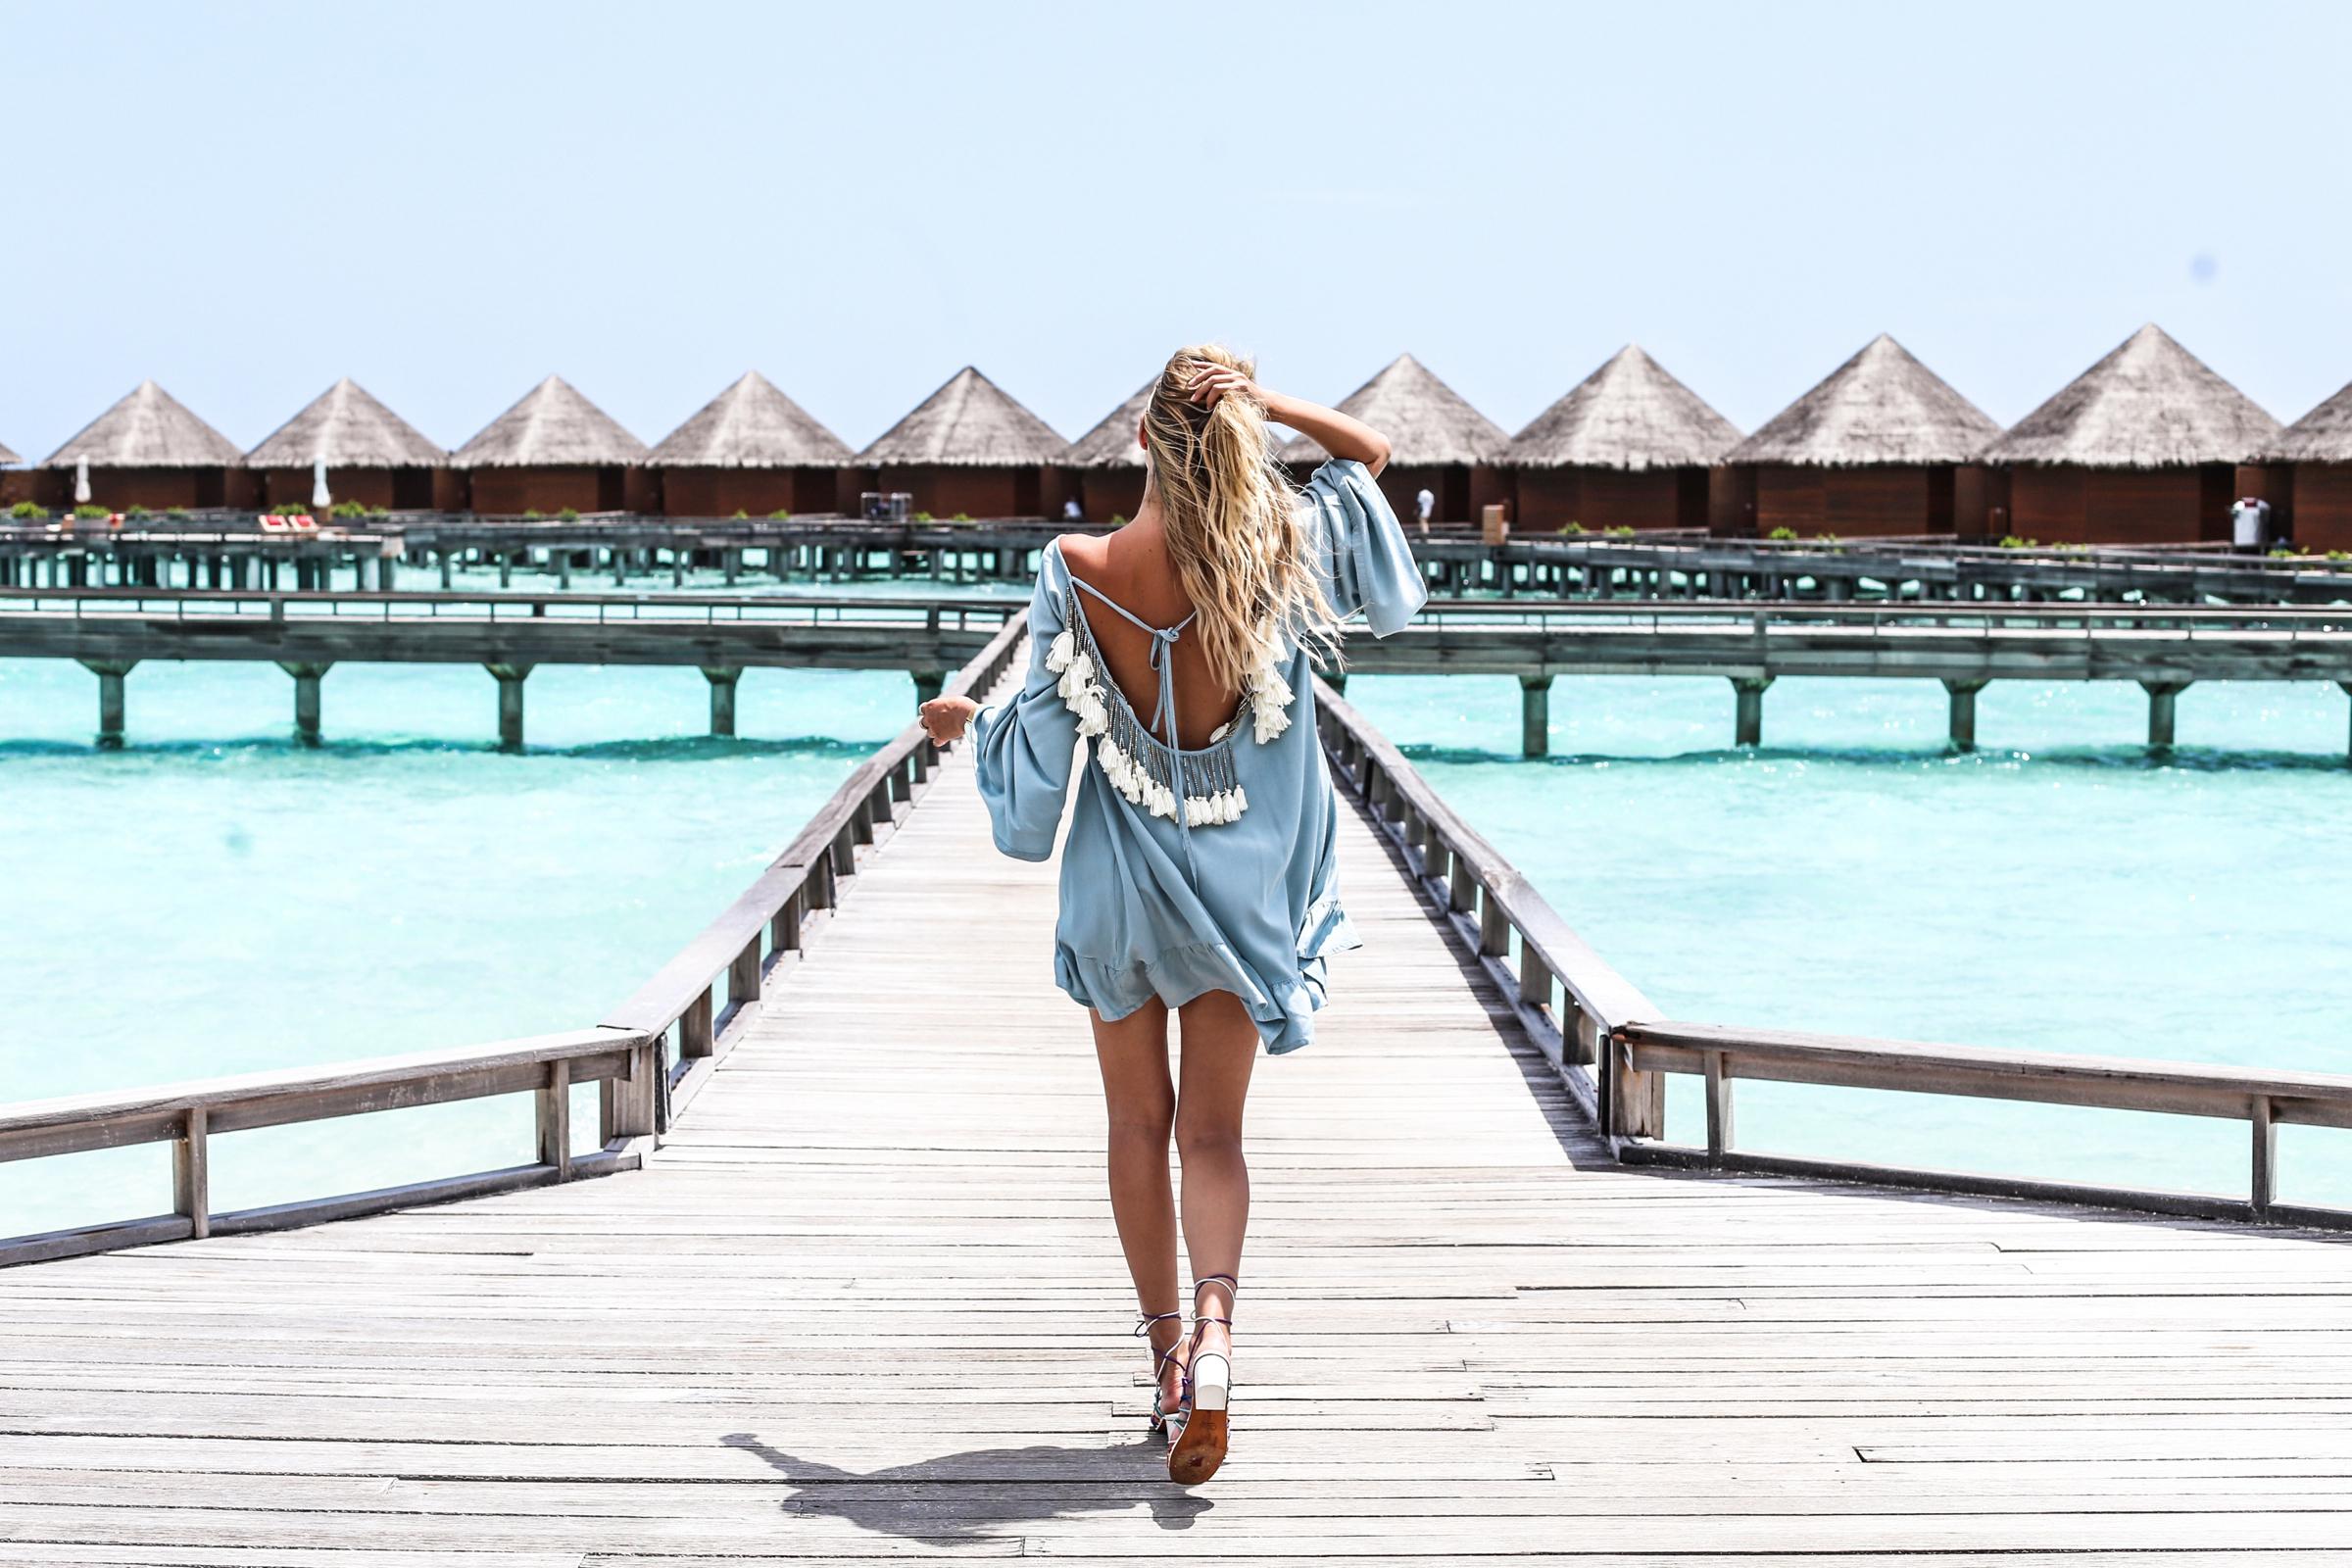 Rainbow sandals & tassles | Maldives